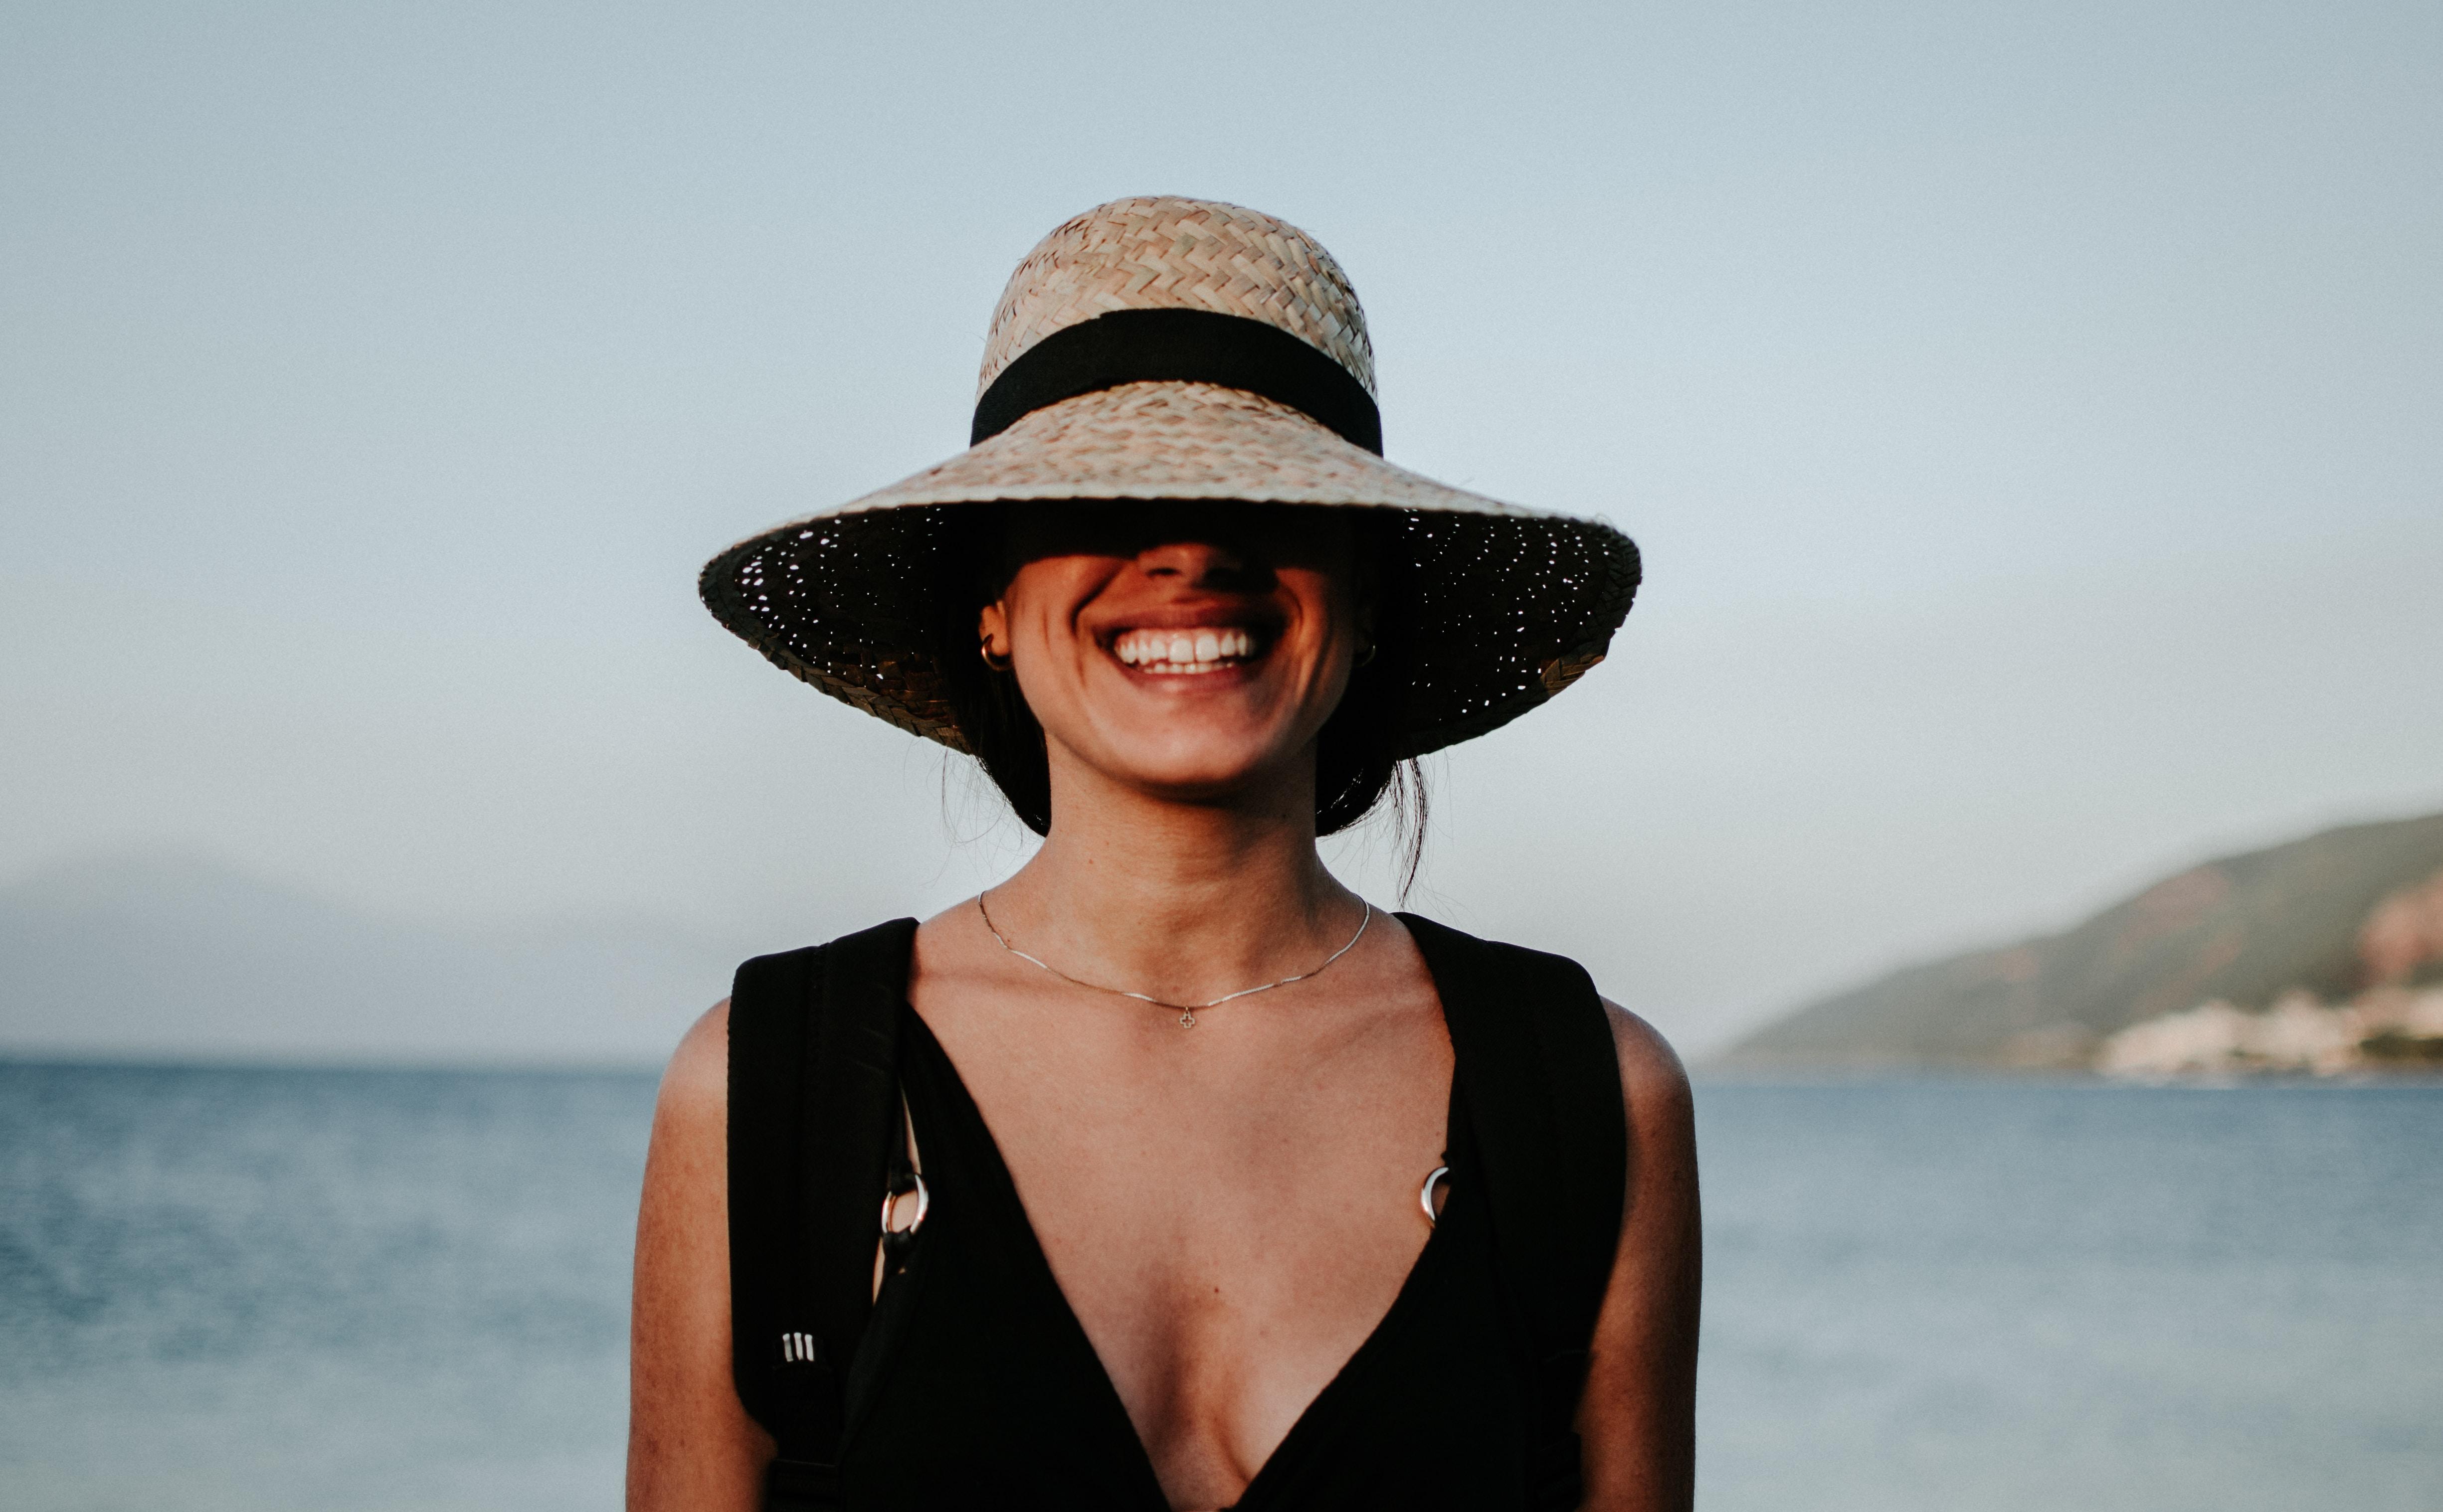 woman wearing sun hat while smiling